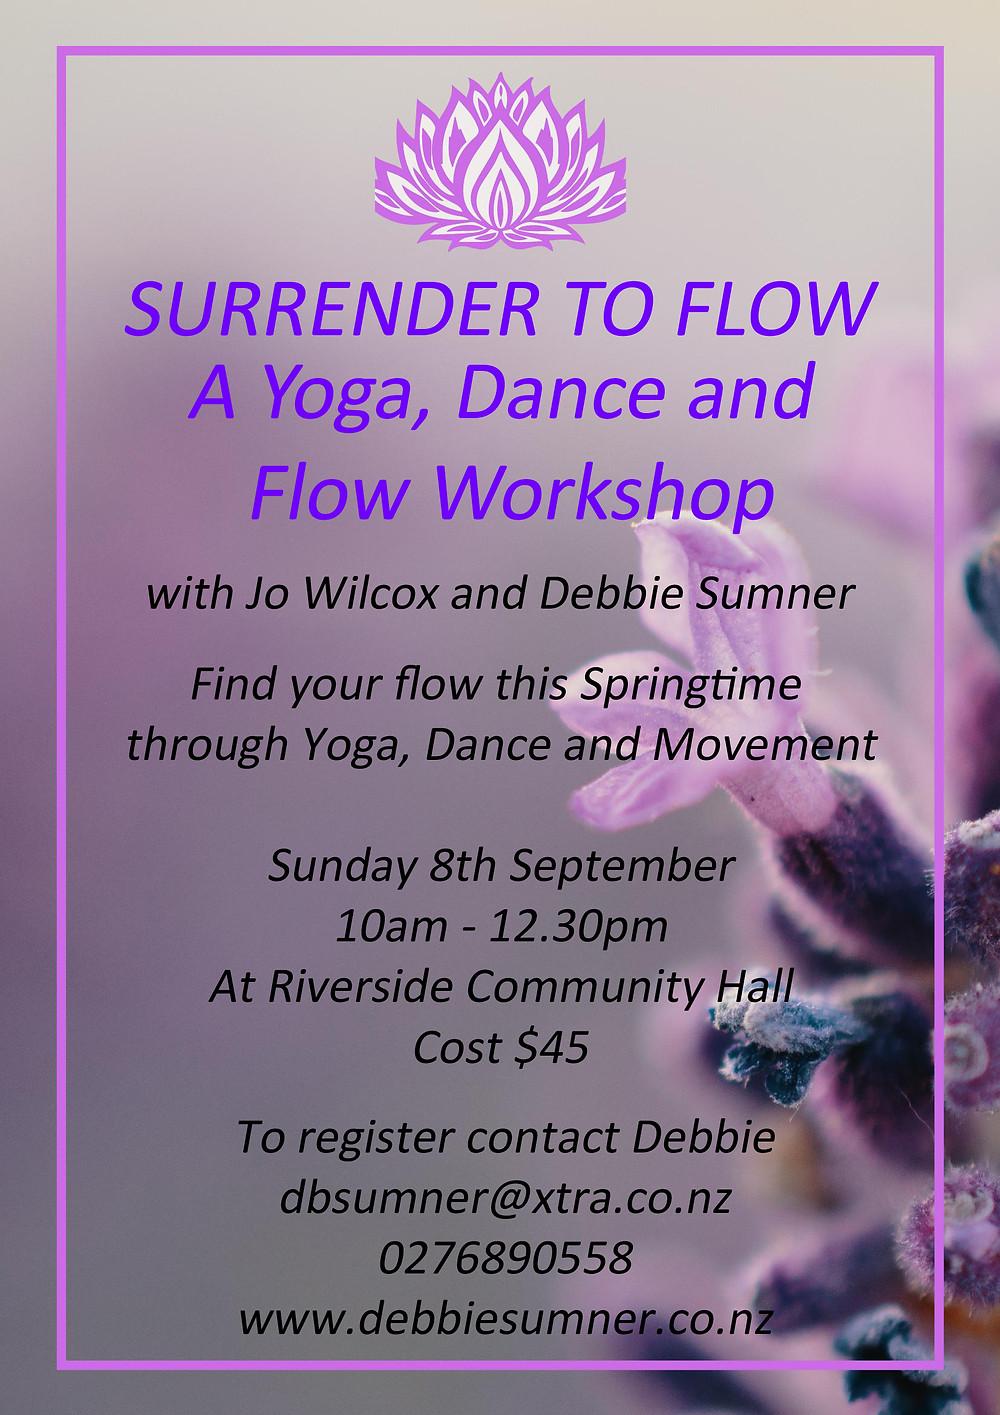 Yoga workshop at Riverside Poster with flower